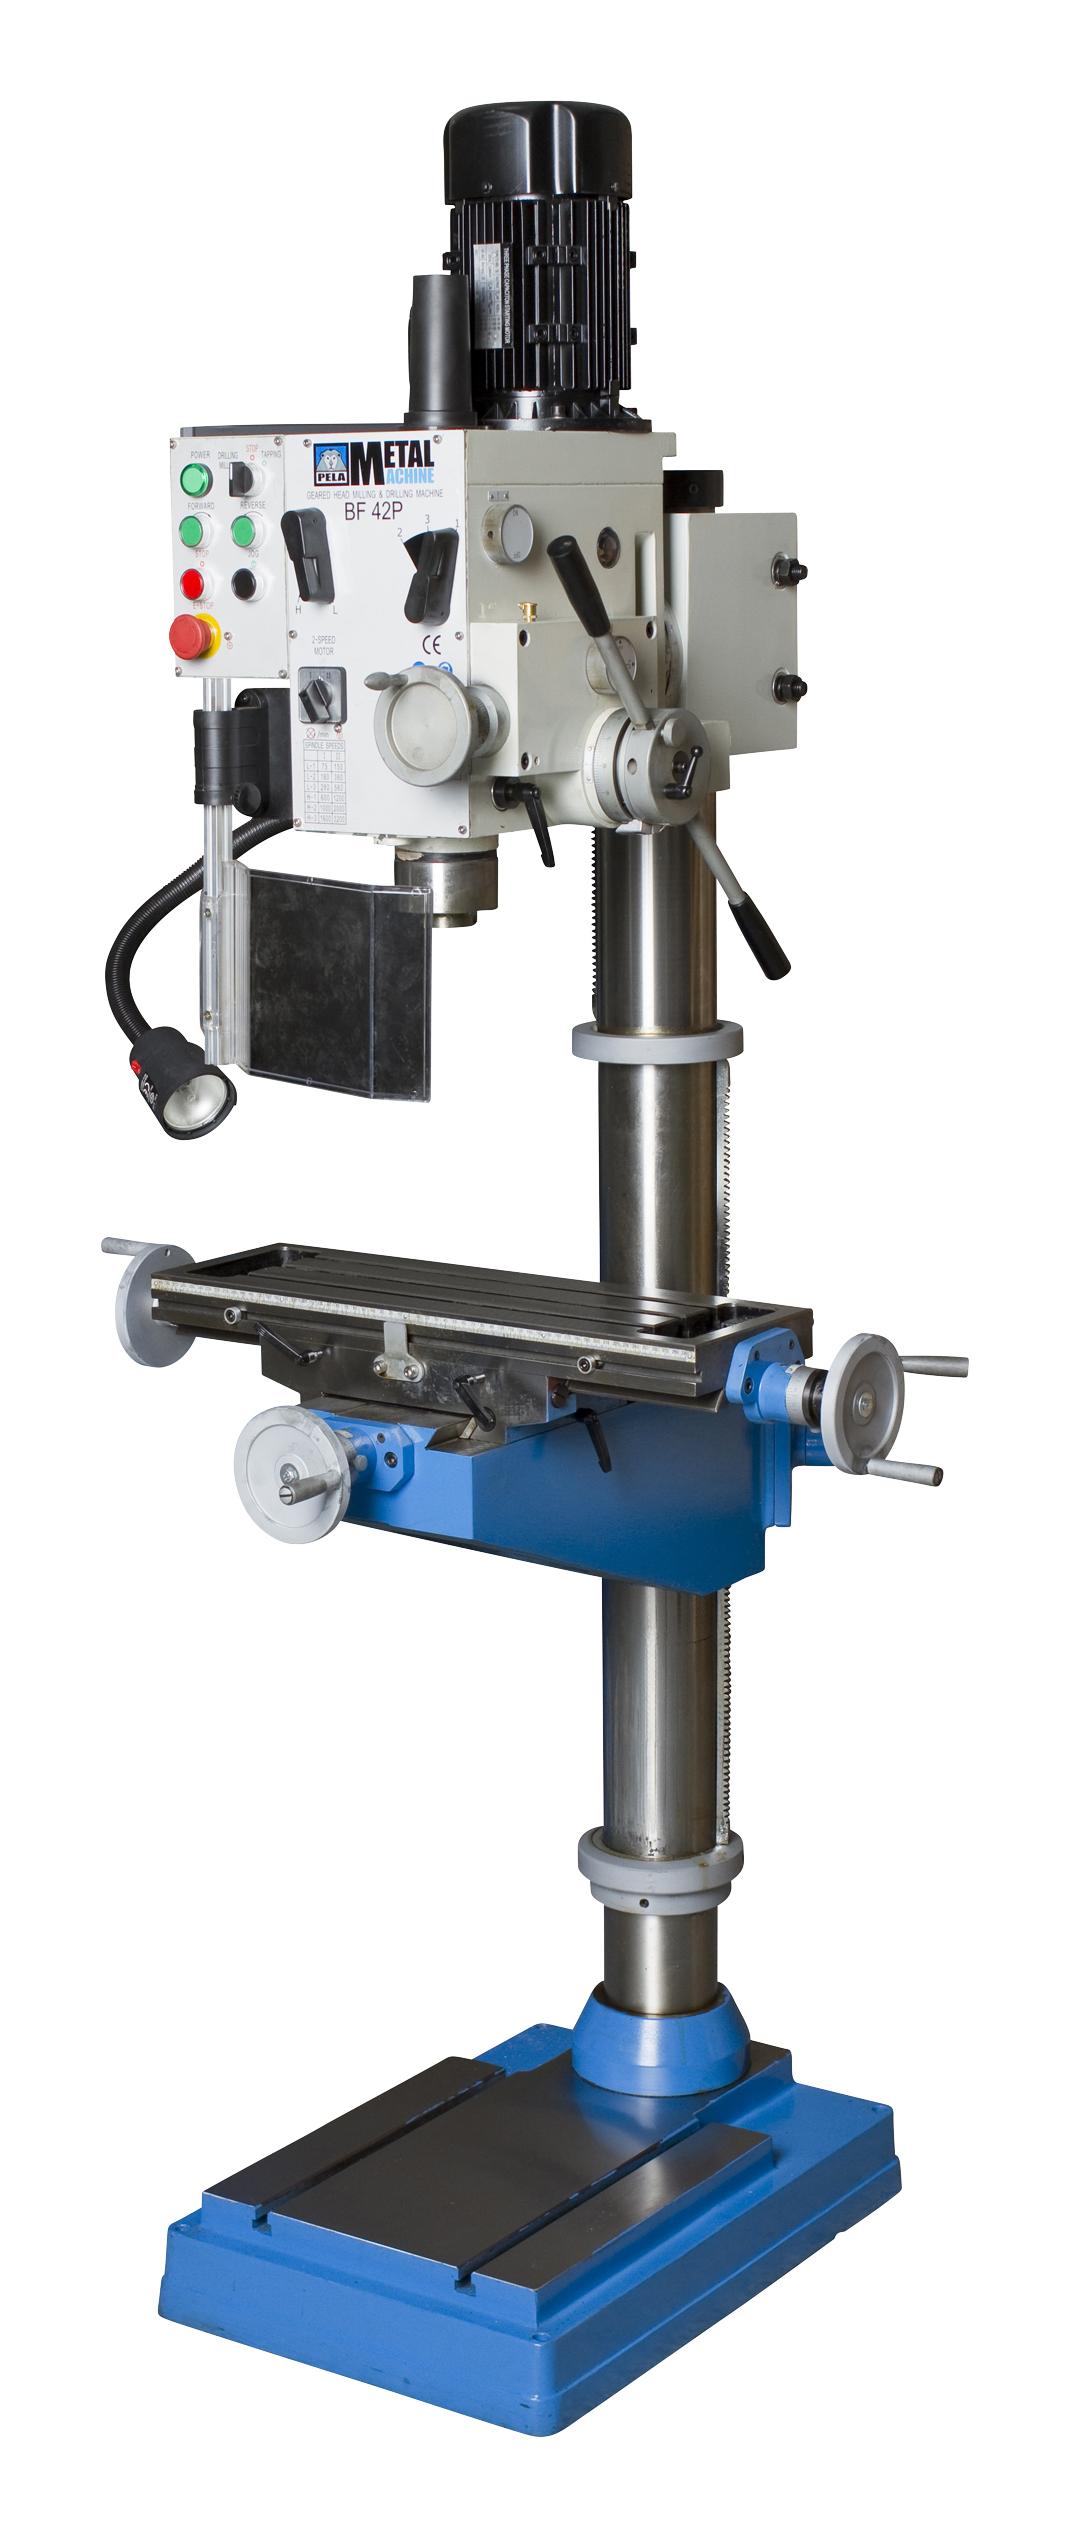 Buy Drill & milling machine BF42P at Pela Tools